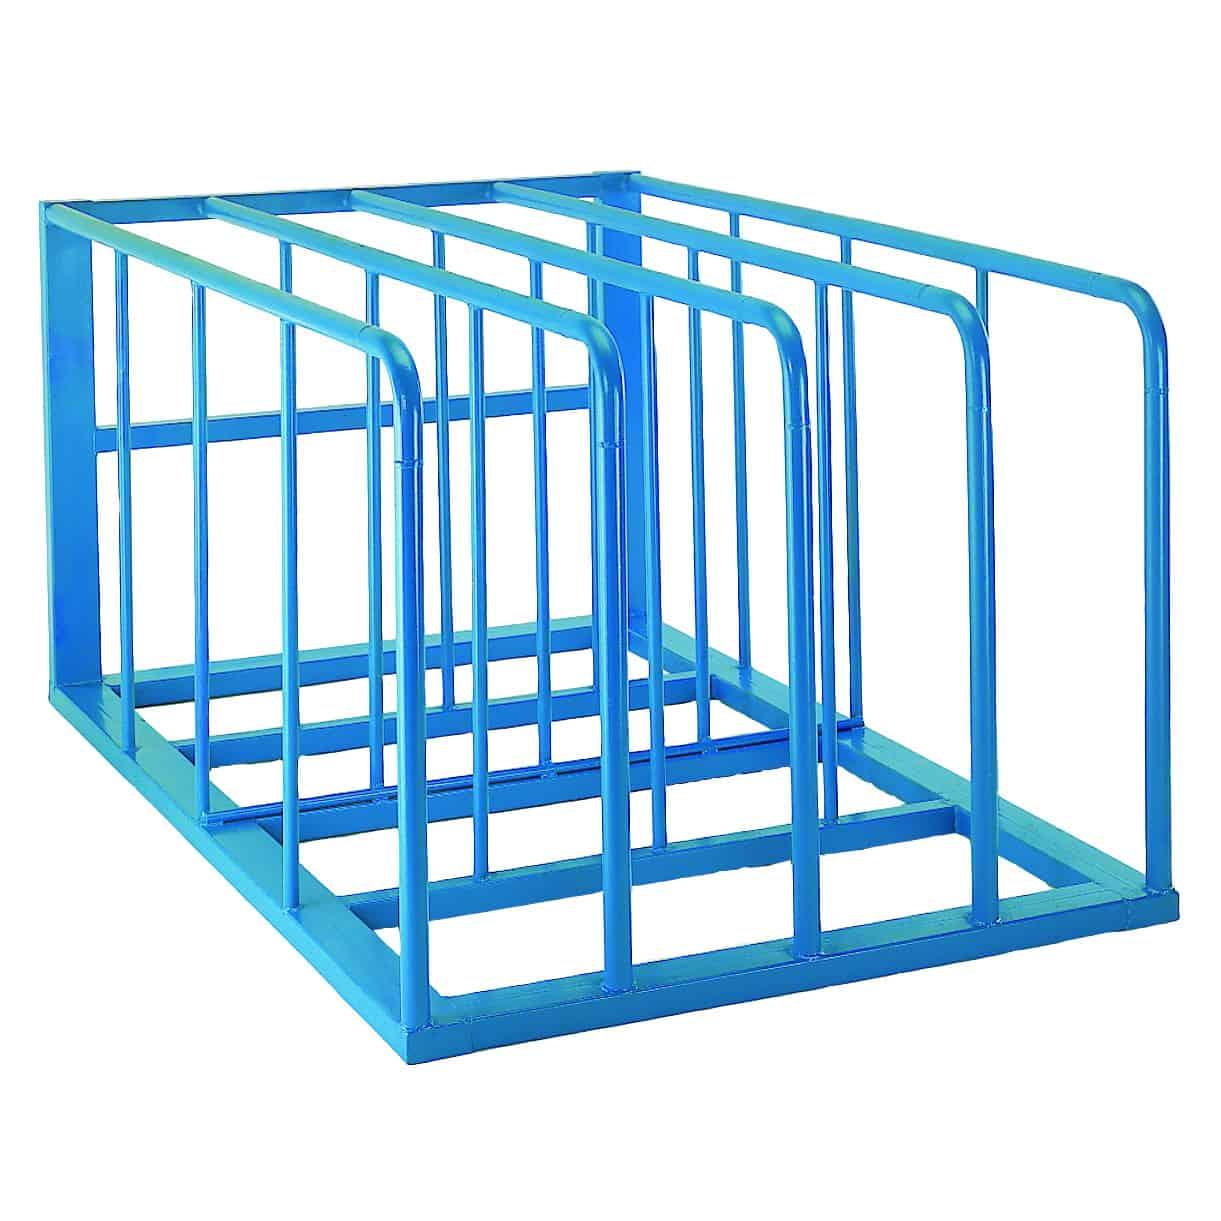 Multipurpose Standard Steel Sheet Rack